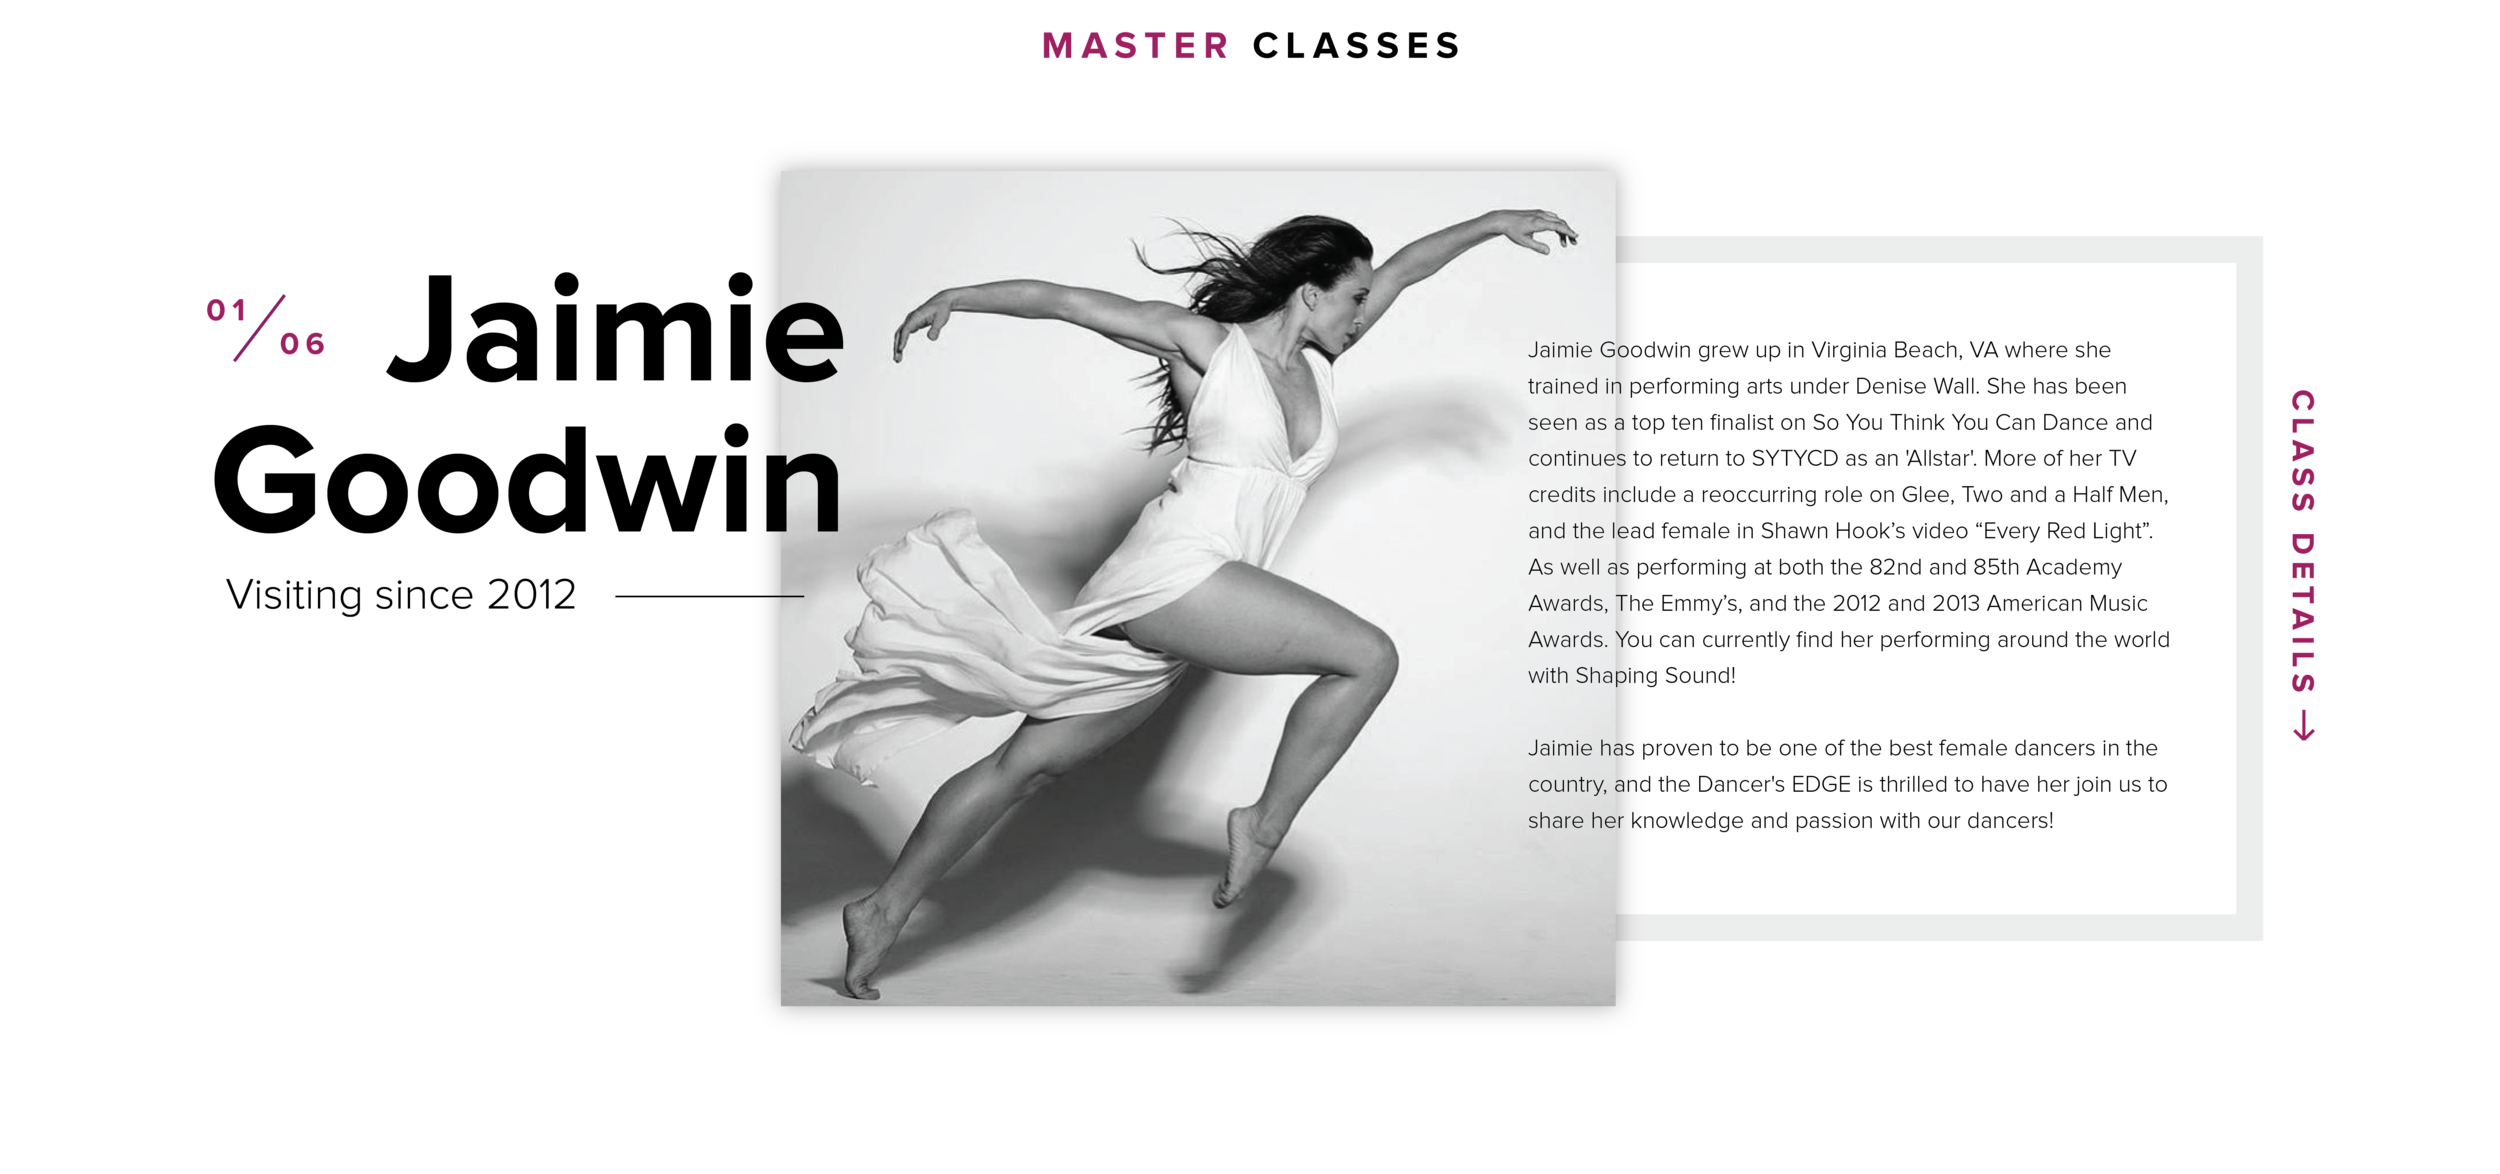 Jaimie Goodwin Masterclass at the Dancer's EDGE